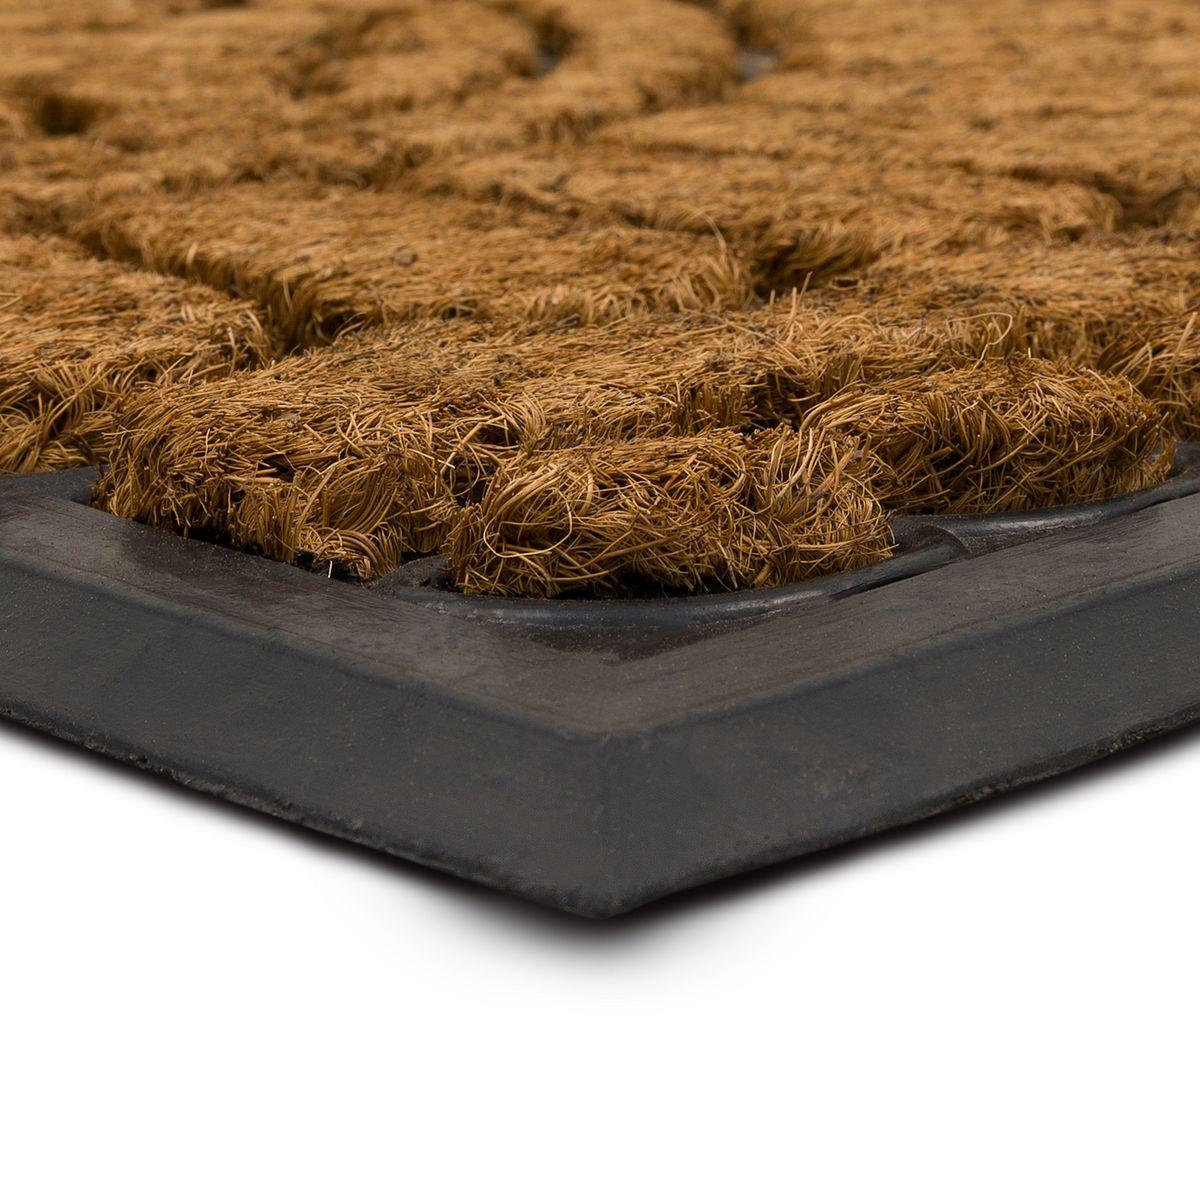 Mohawk Home Rope Slice Doormat 5Rrj8